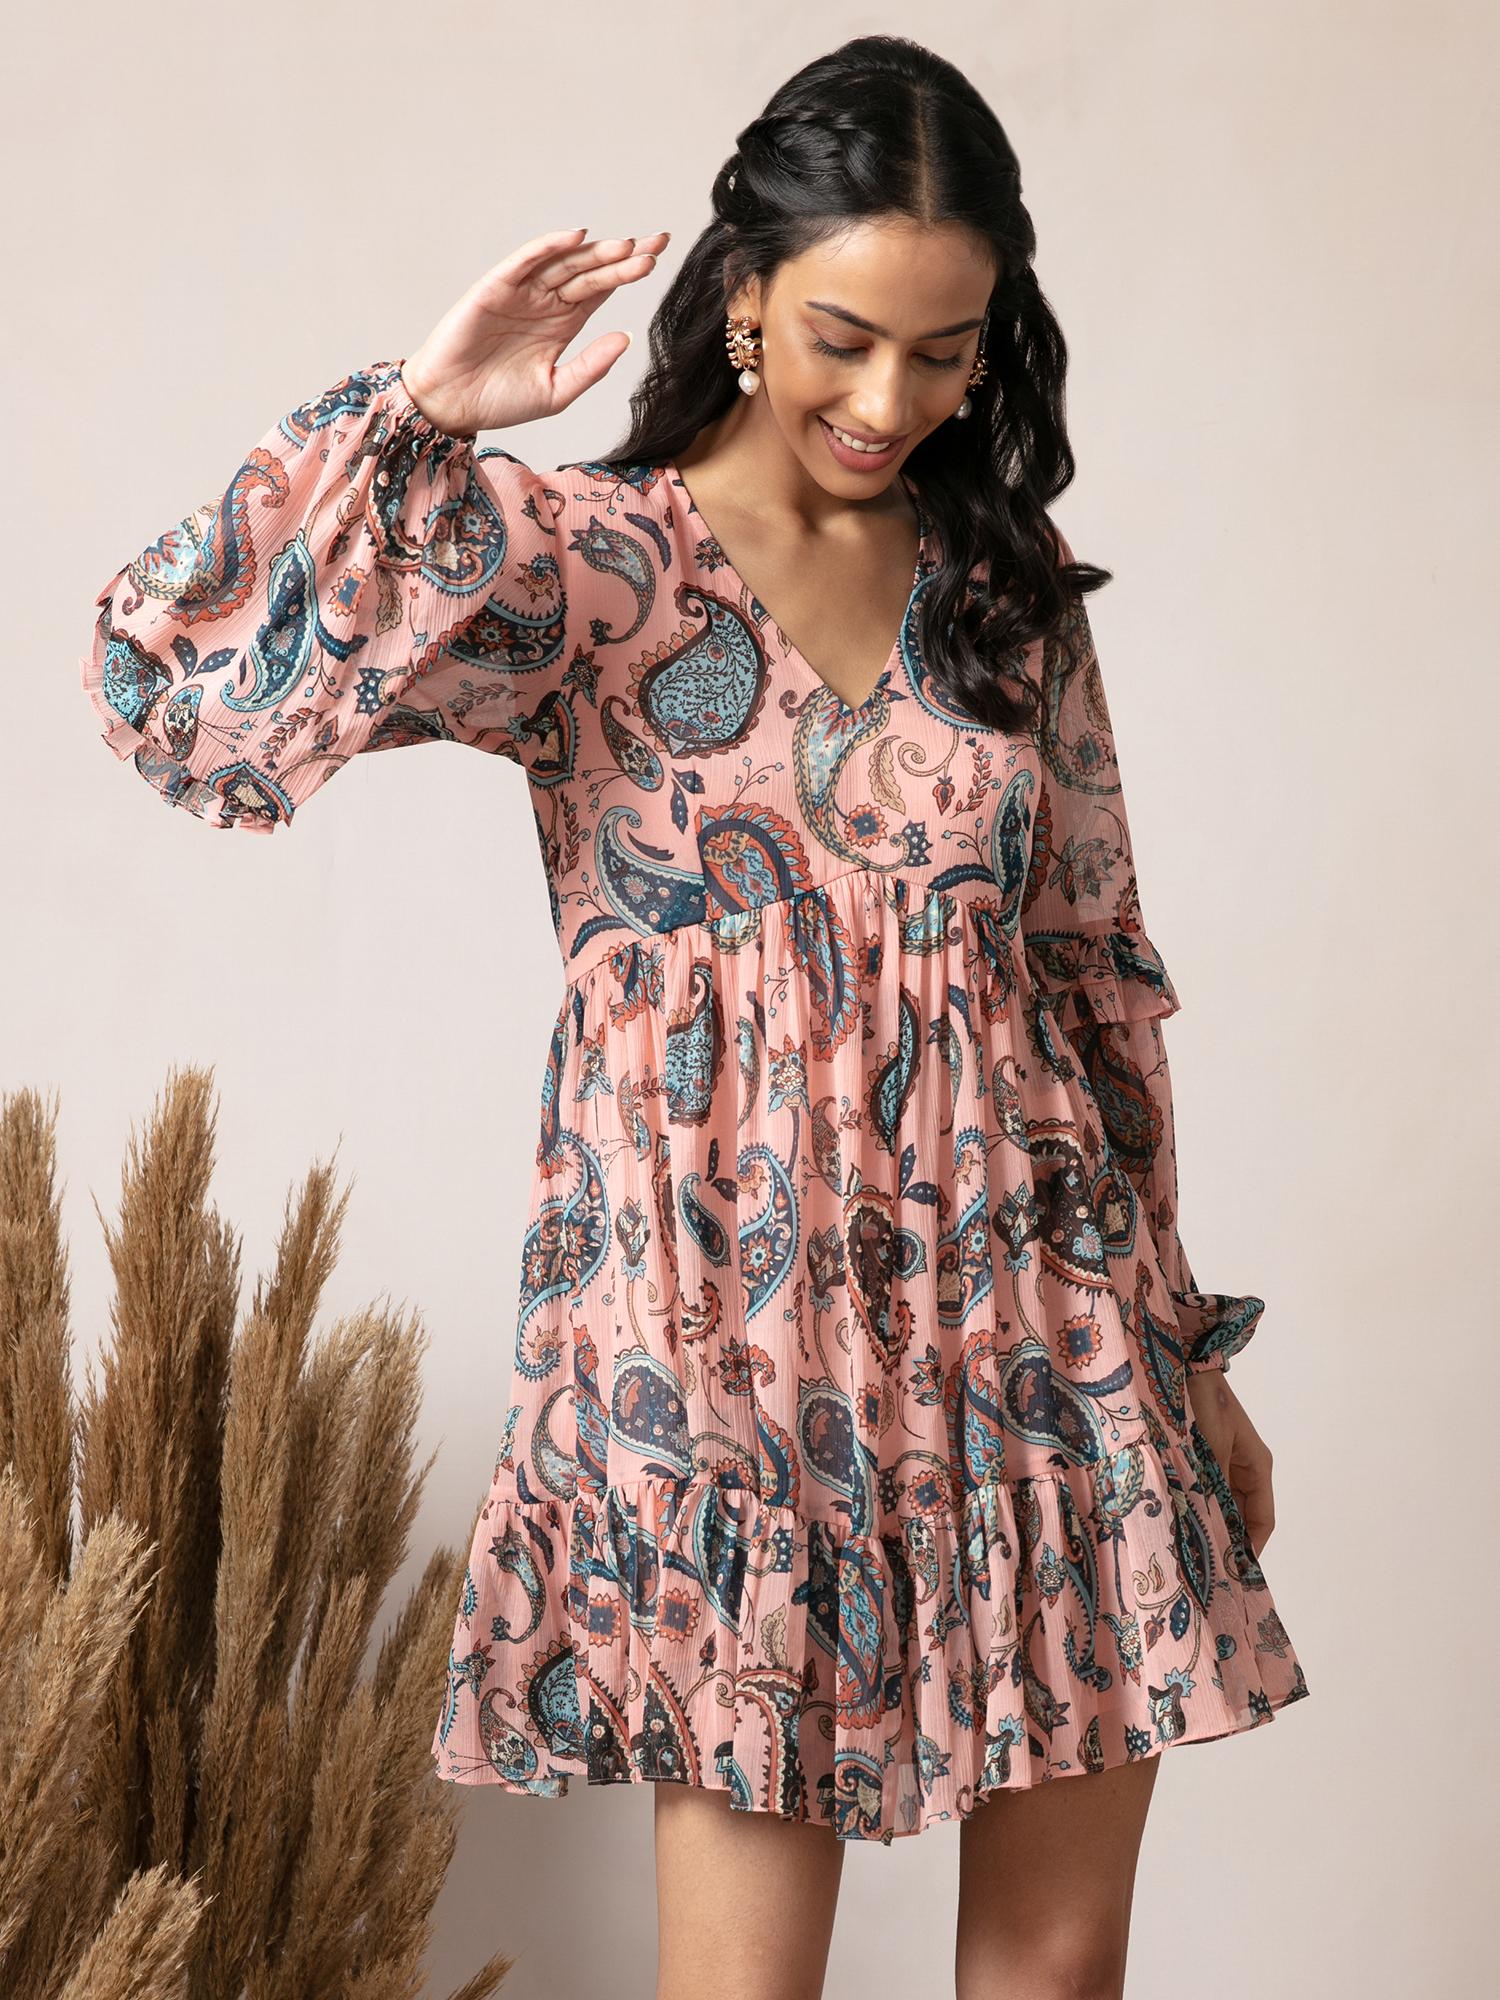 Dresses-The Bohemian Beauty Dress2